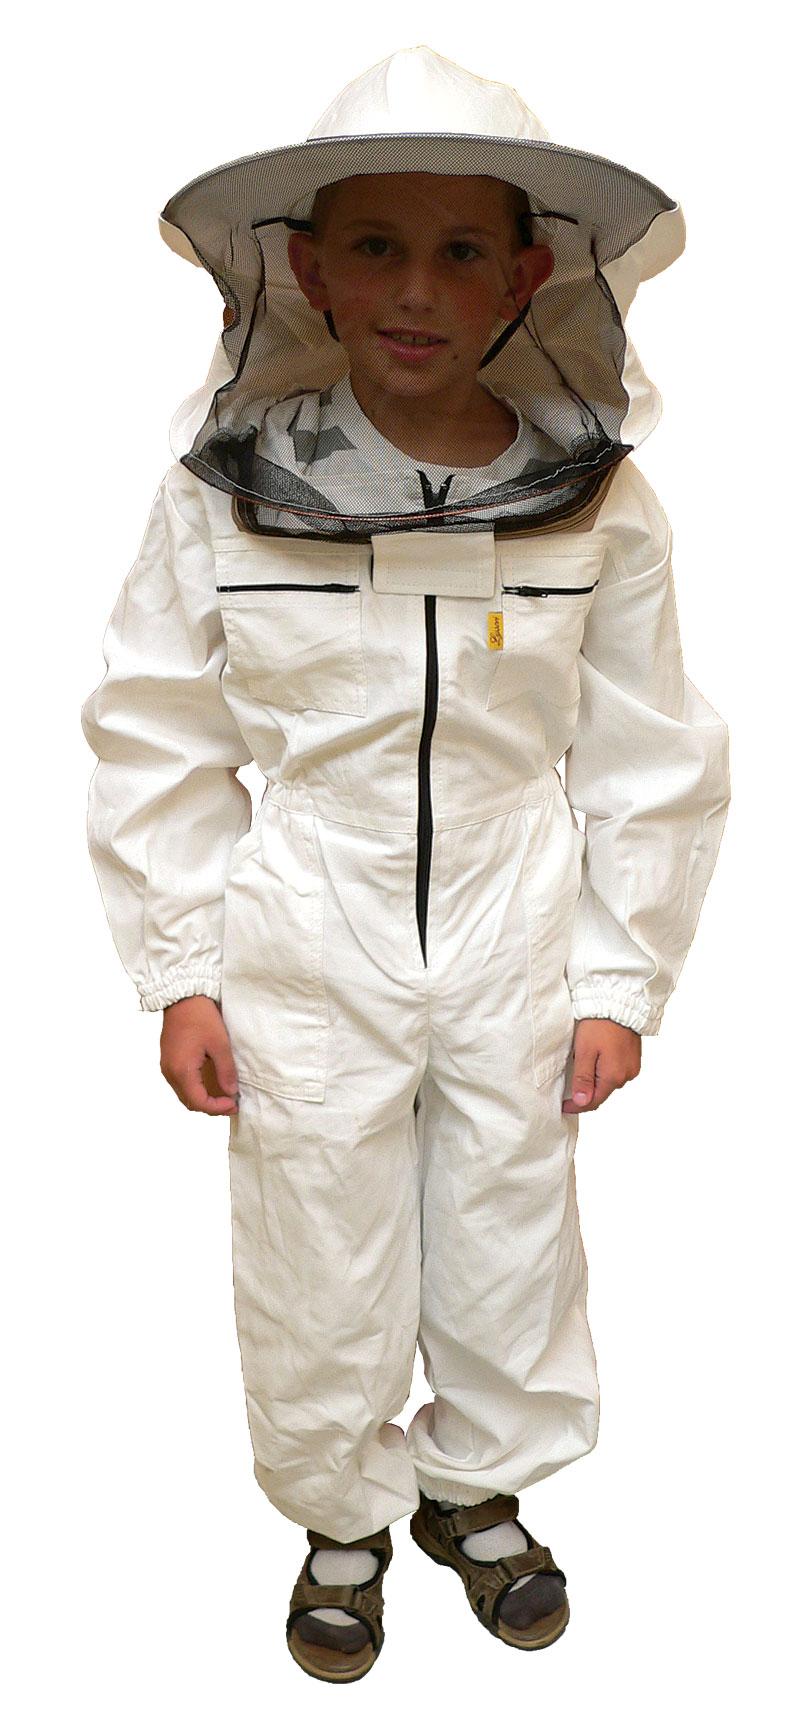 Картинка костюма пчеловода